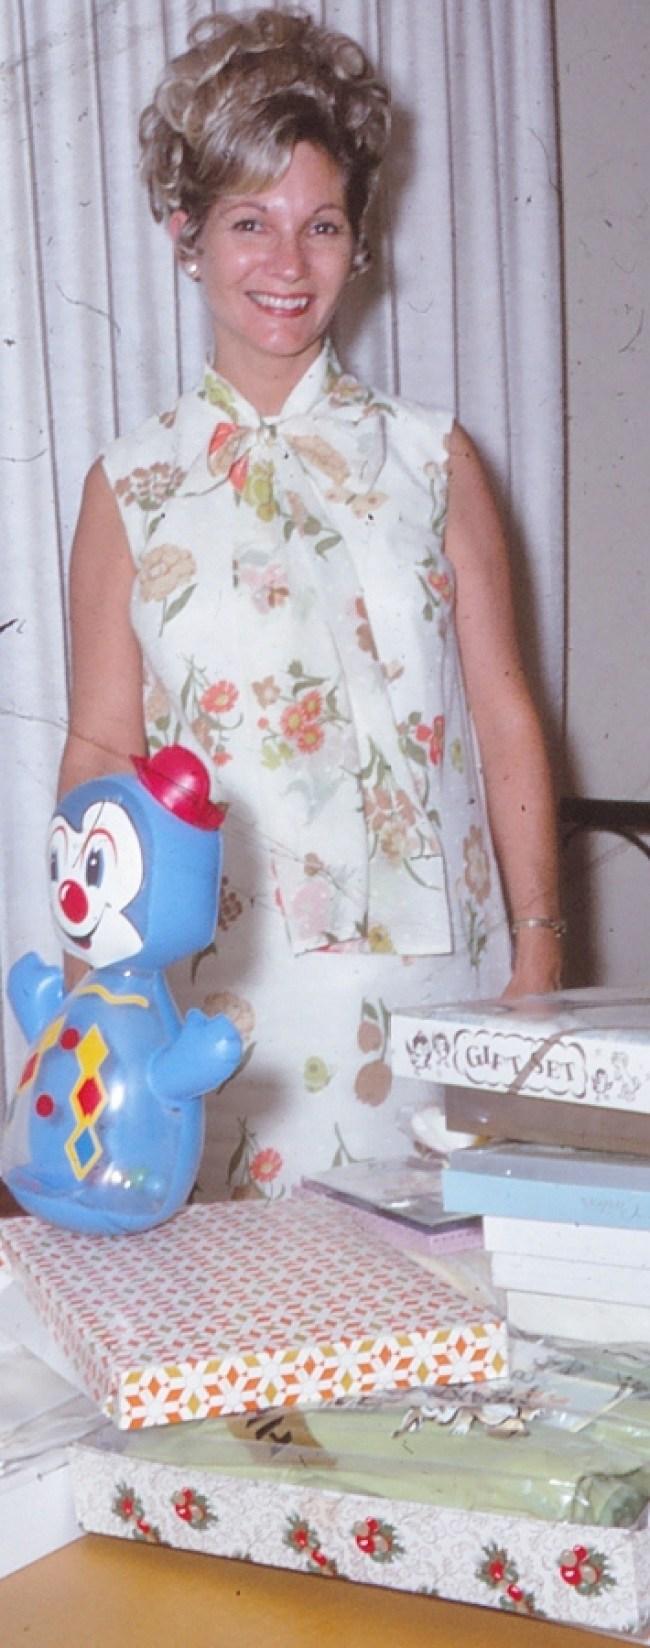 Silent Gen Mom at her 1970 Baby Shower